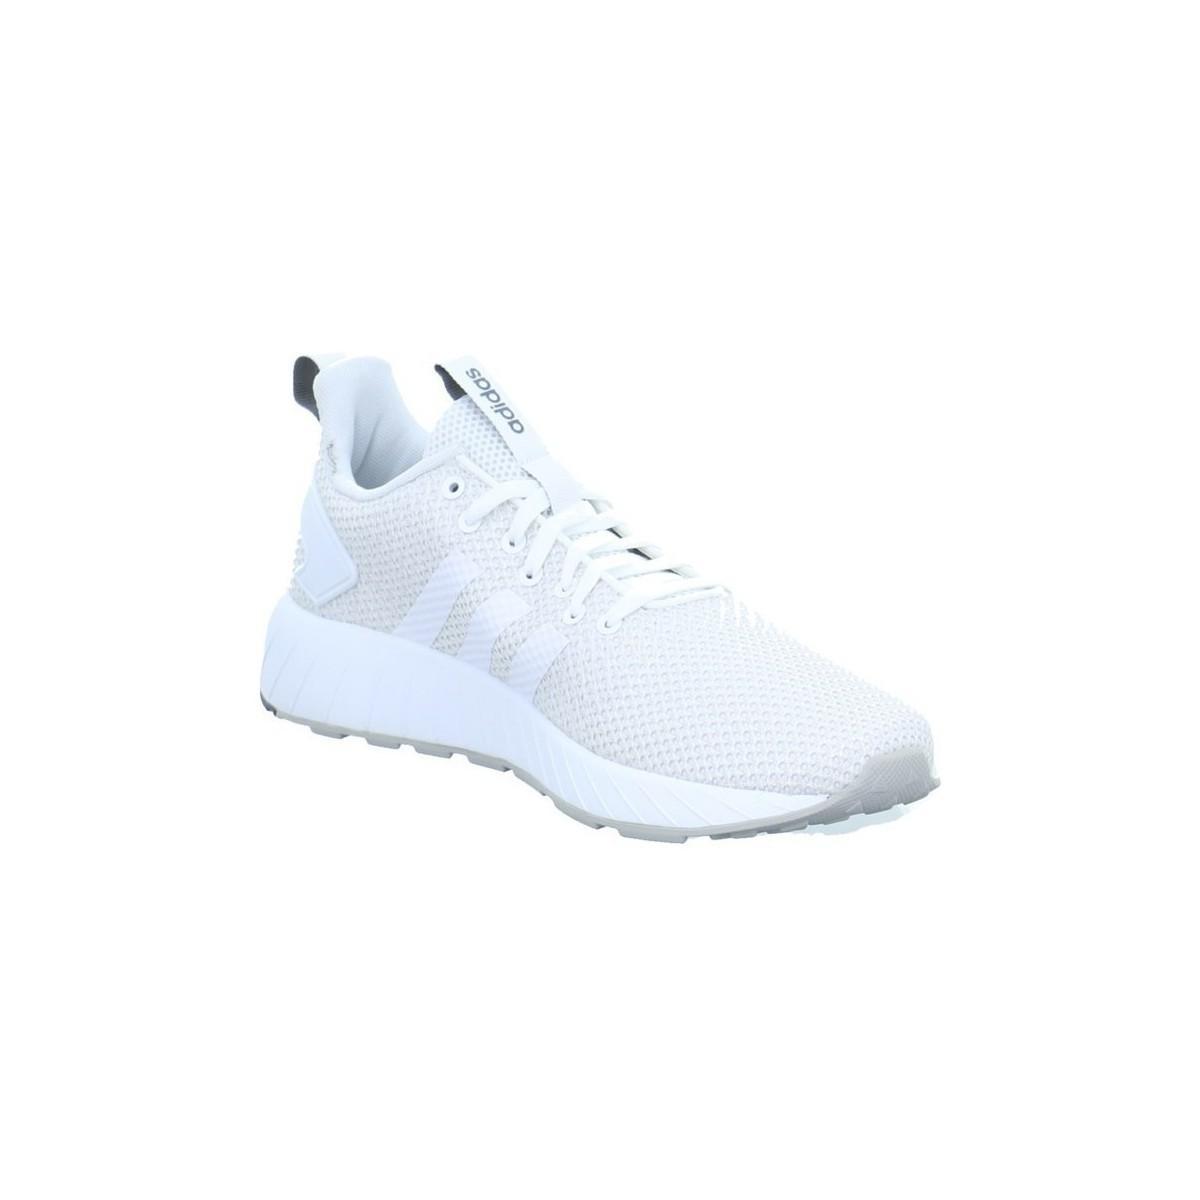 Lyst adidas questar da scarpe da uomo (formatori) in bianco in bianco.